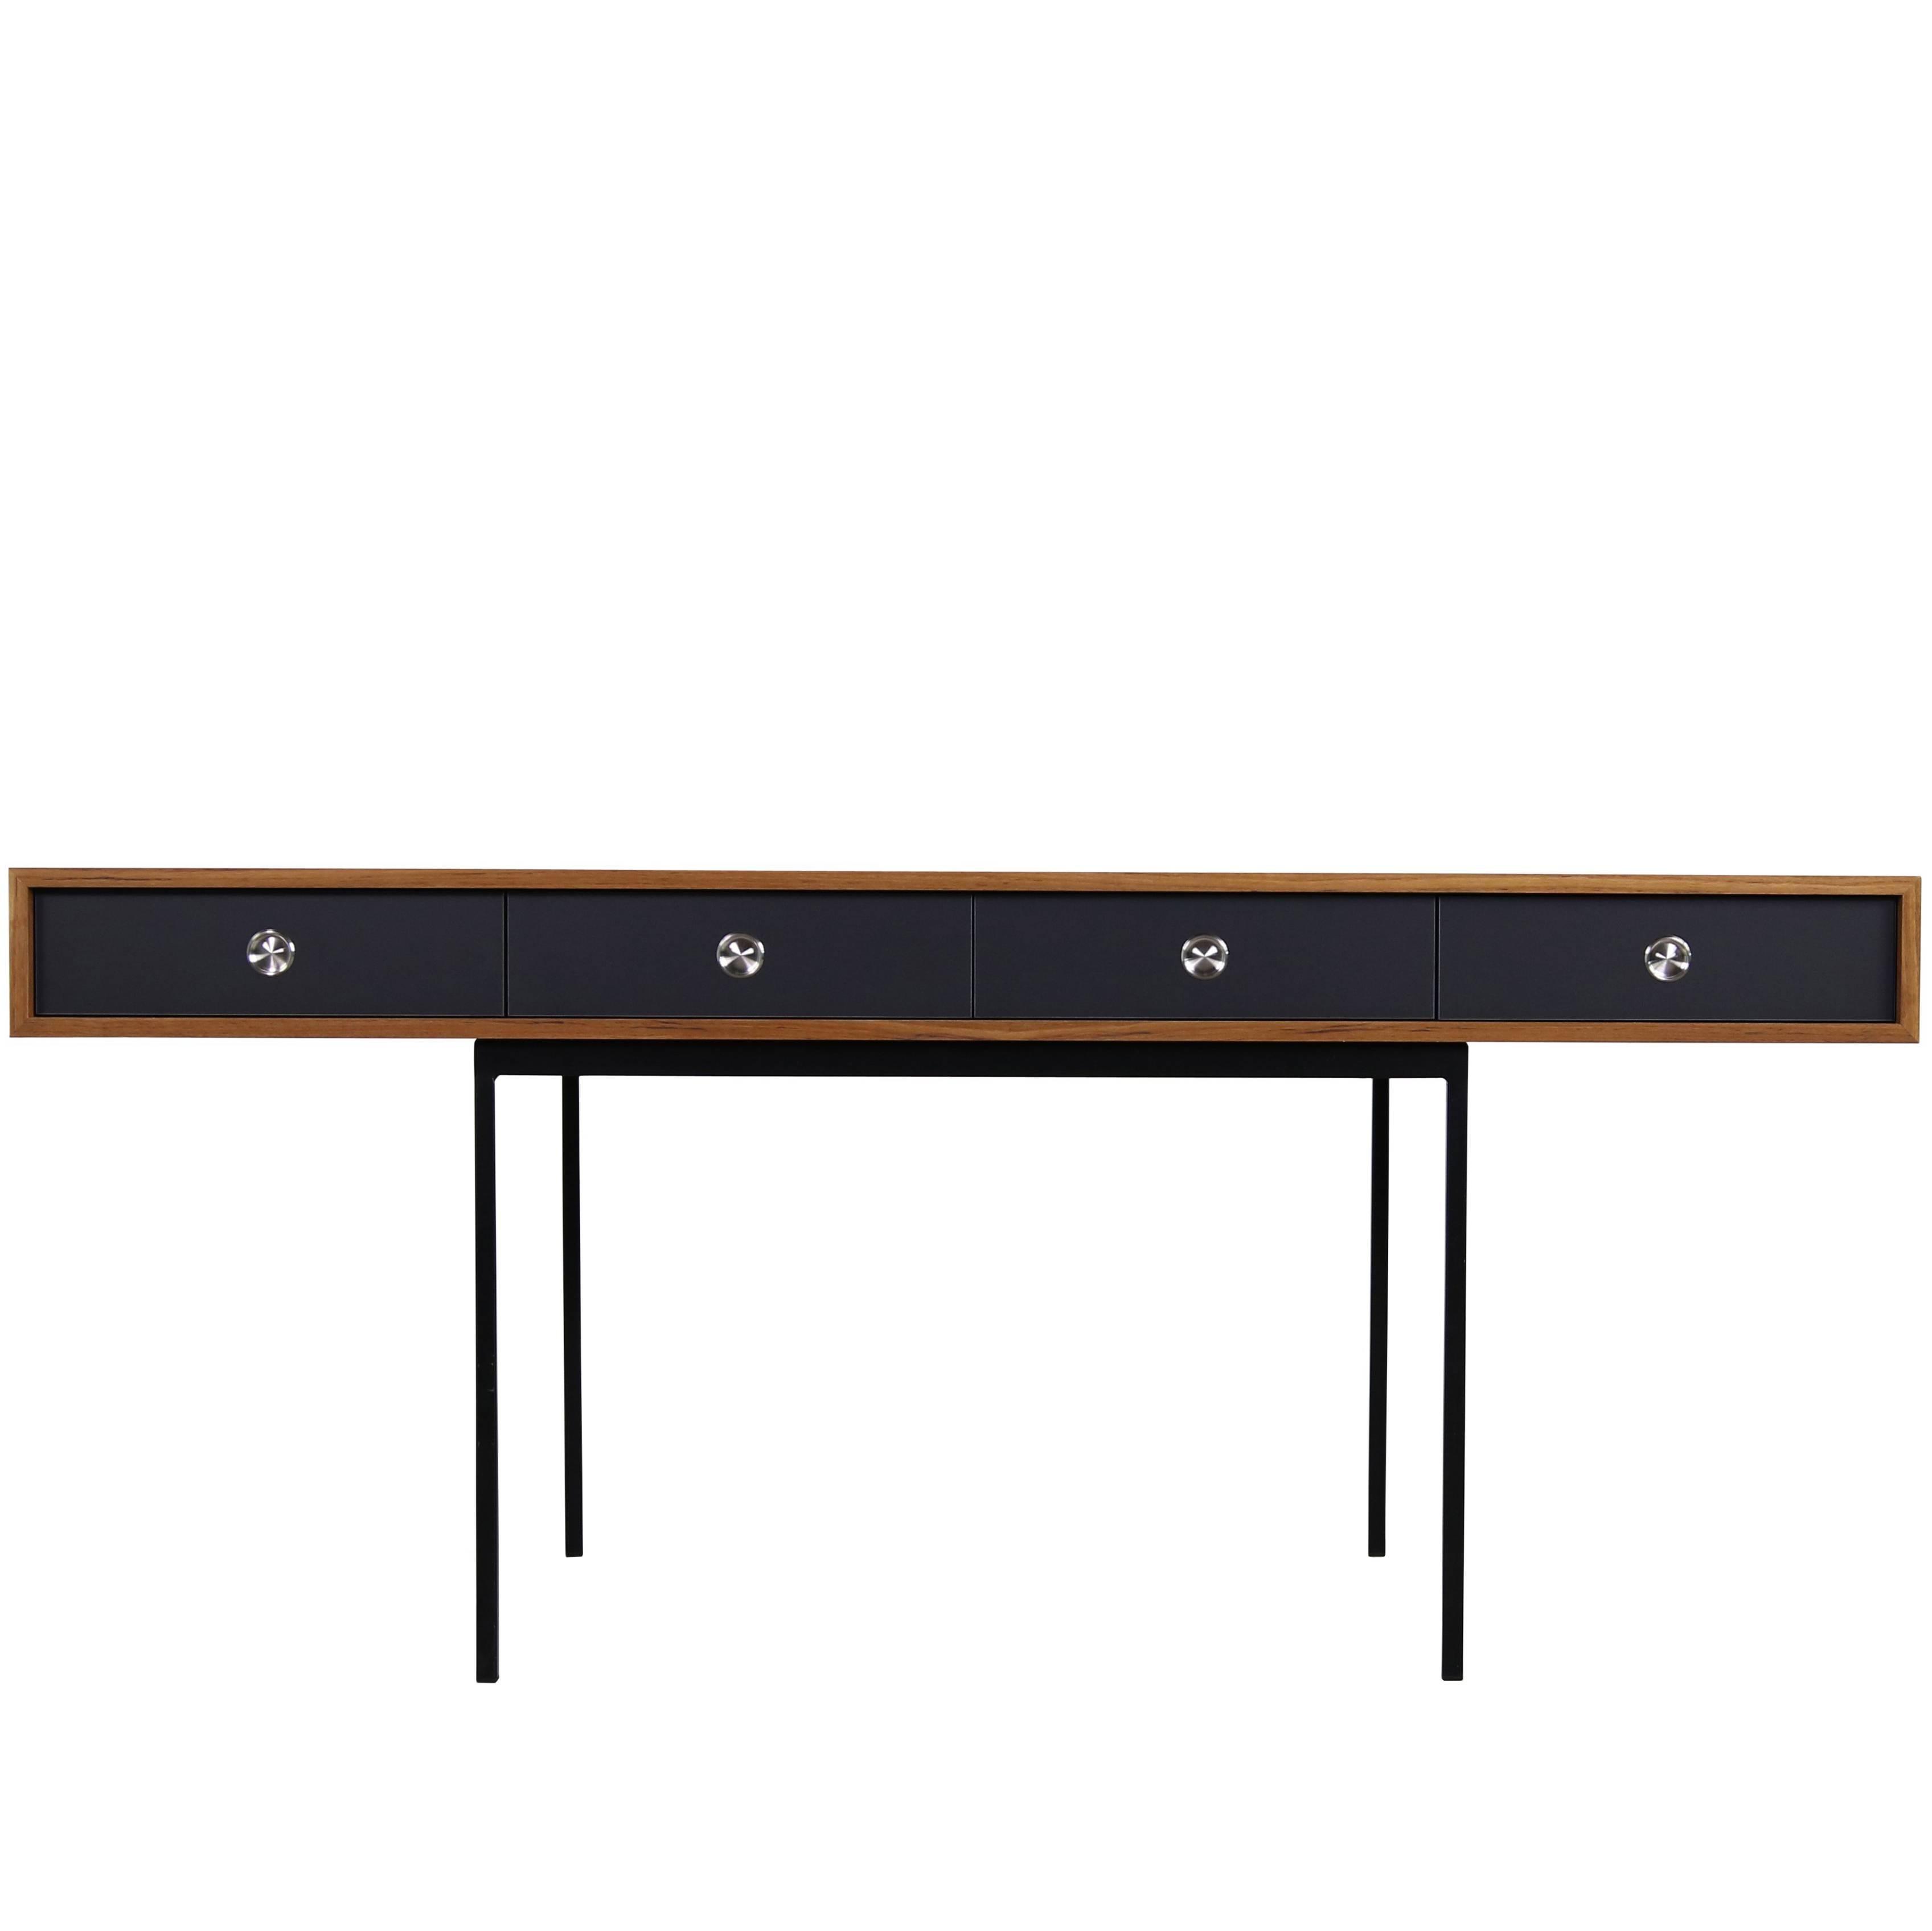 Minimalist Nathan Lindberg Design Teak and Metal Writing Table Mod. NL40 Black